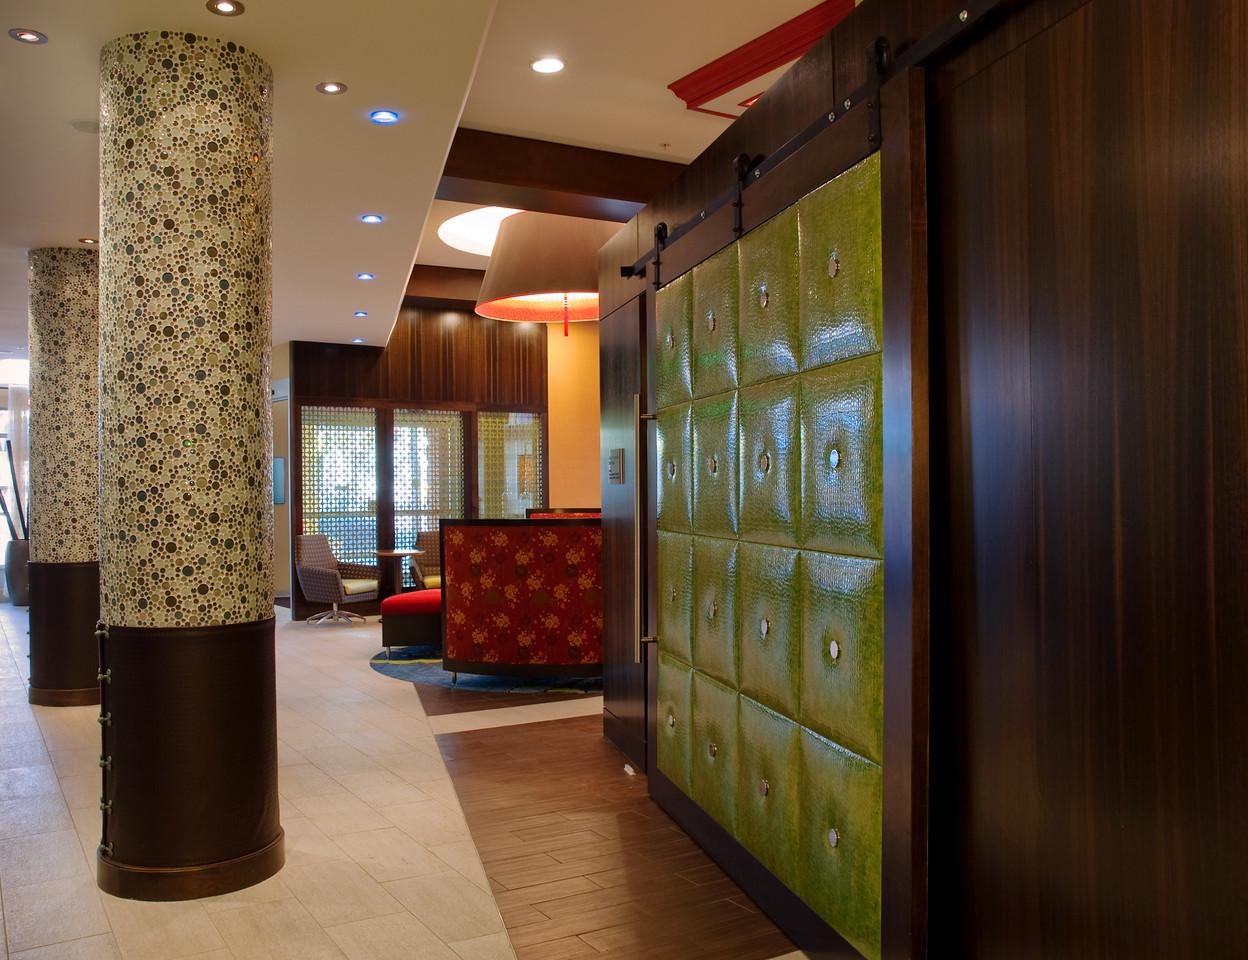 Fairfield Inn and Suites Chinatown, Washington DC